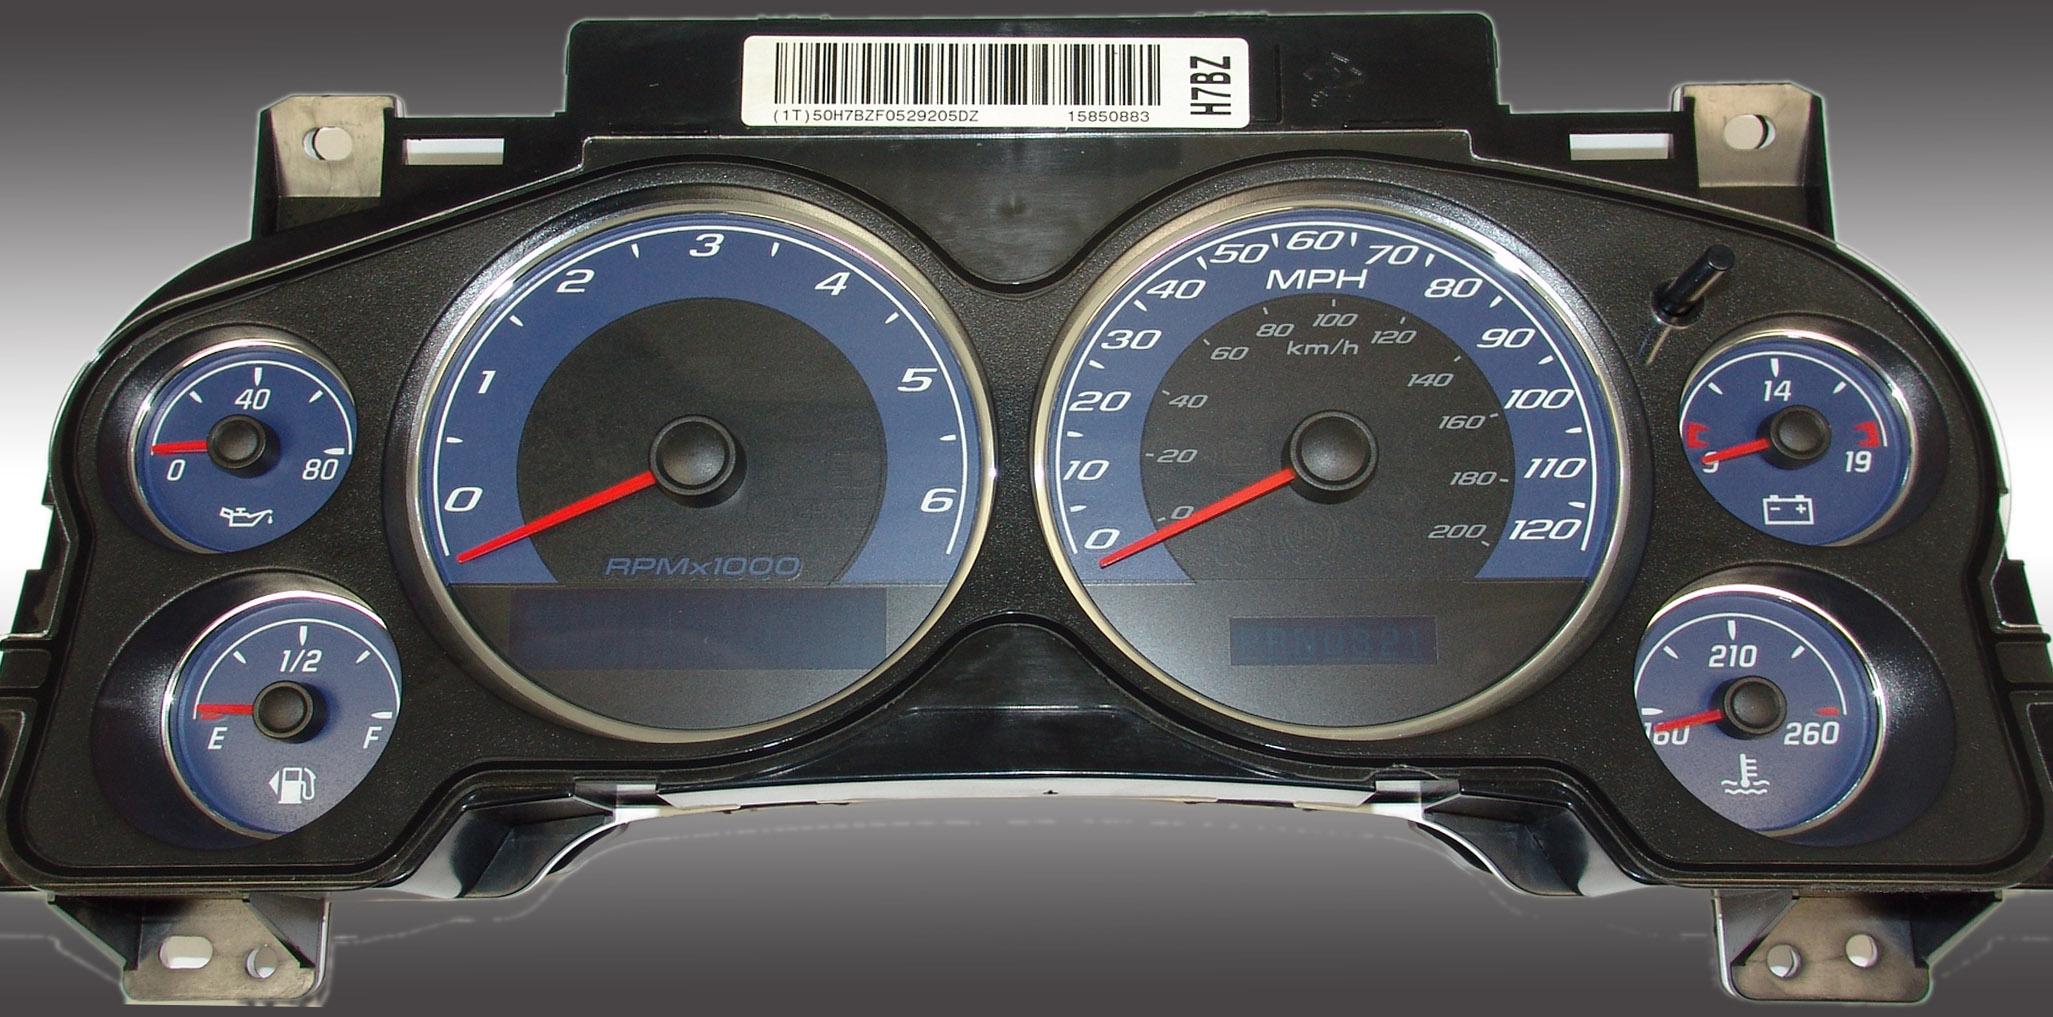 Chevrolet Silverado 2007-2009  Blue / Blue Night Performance Dash Gauges